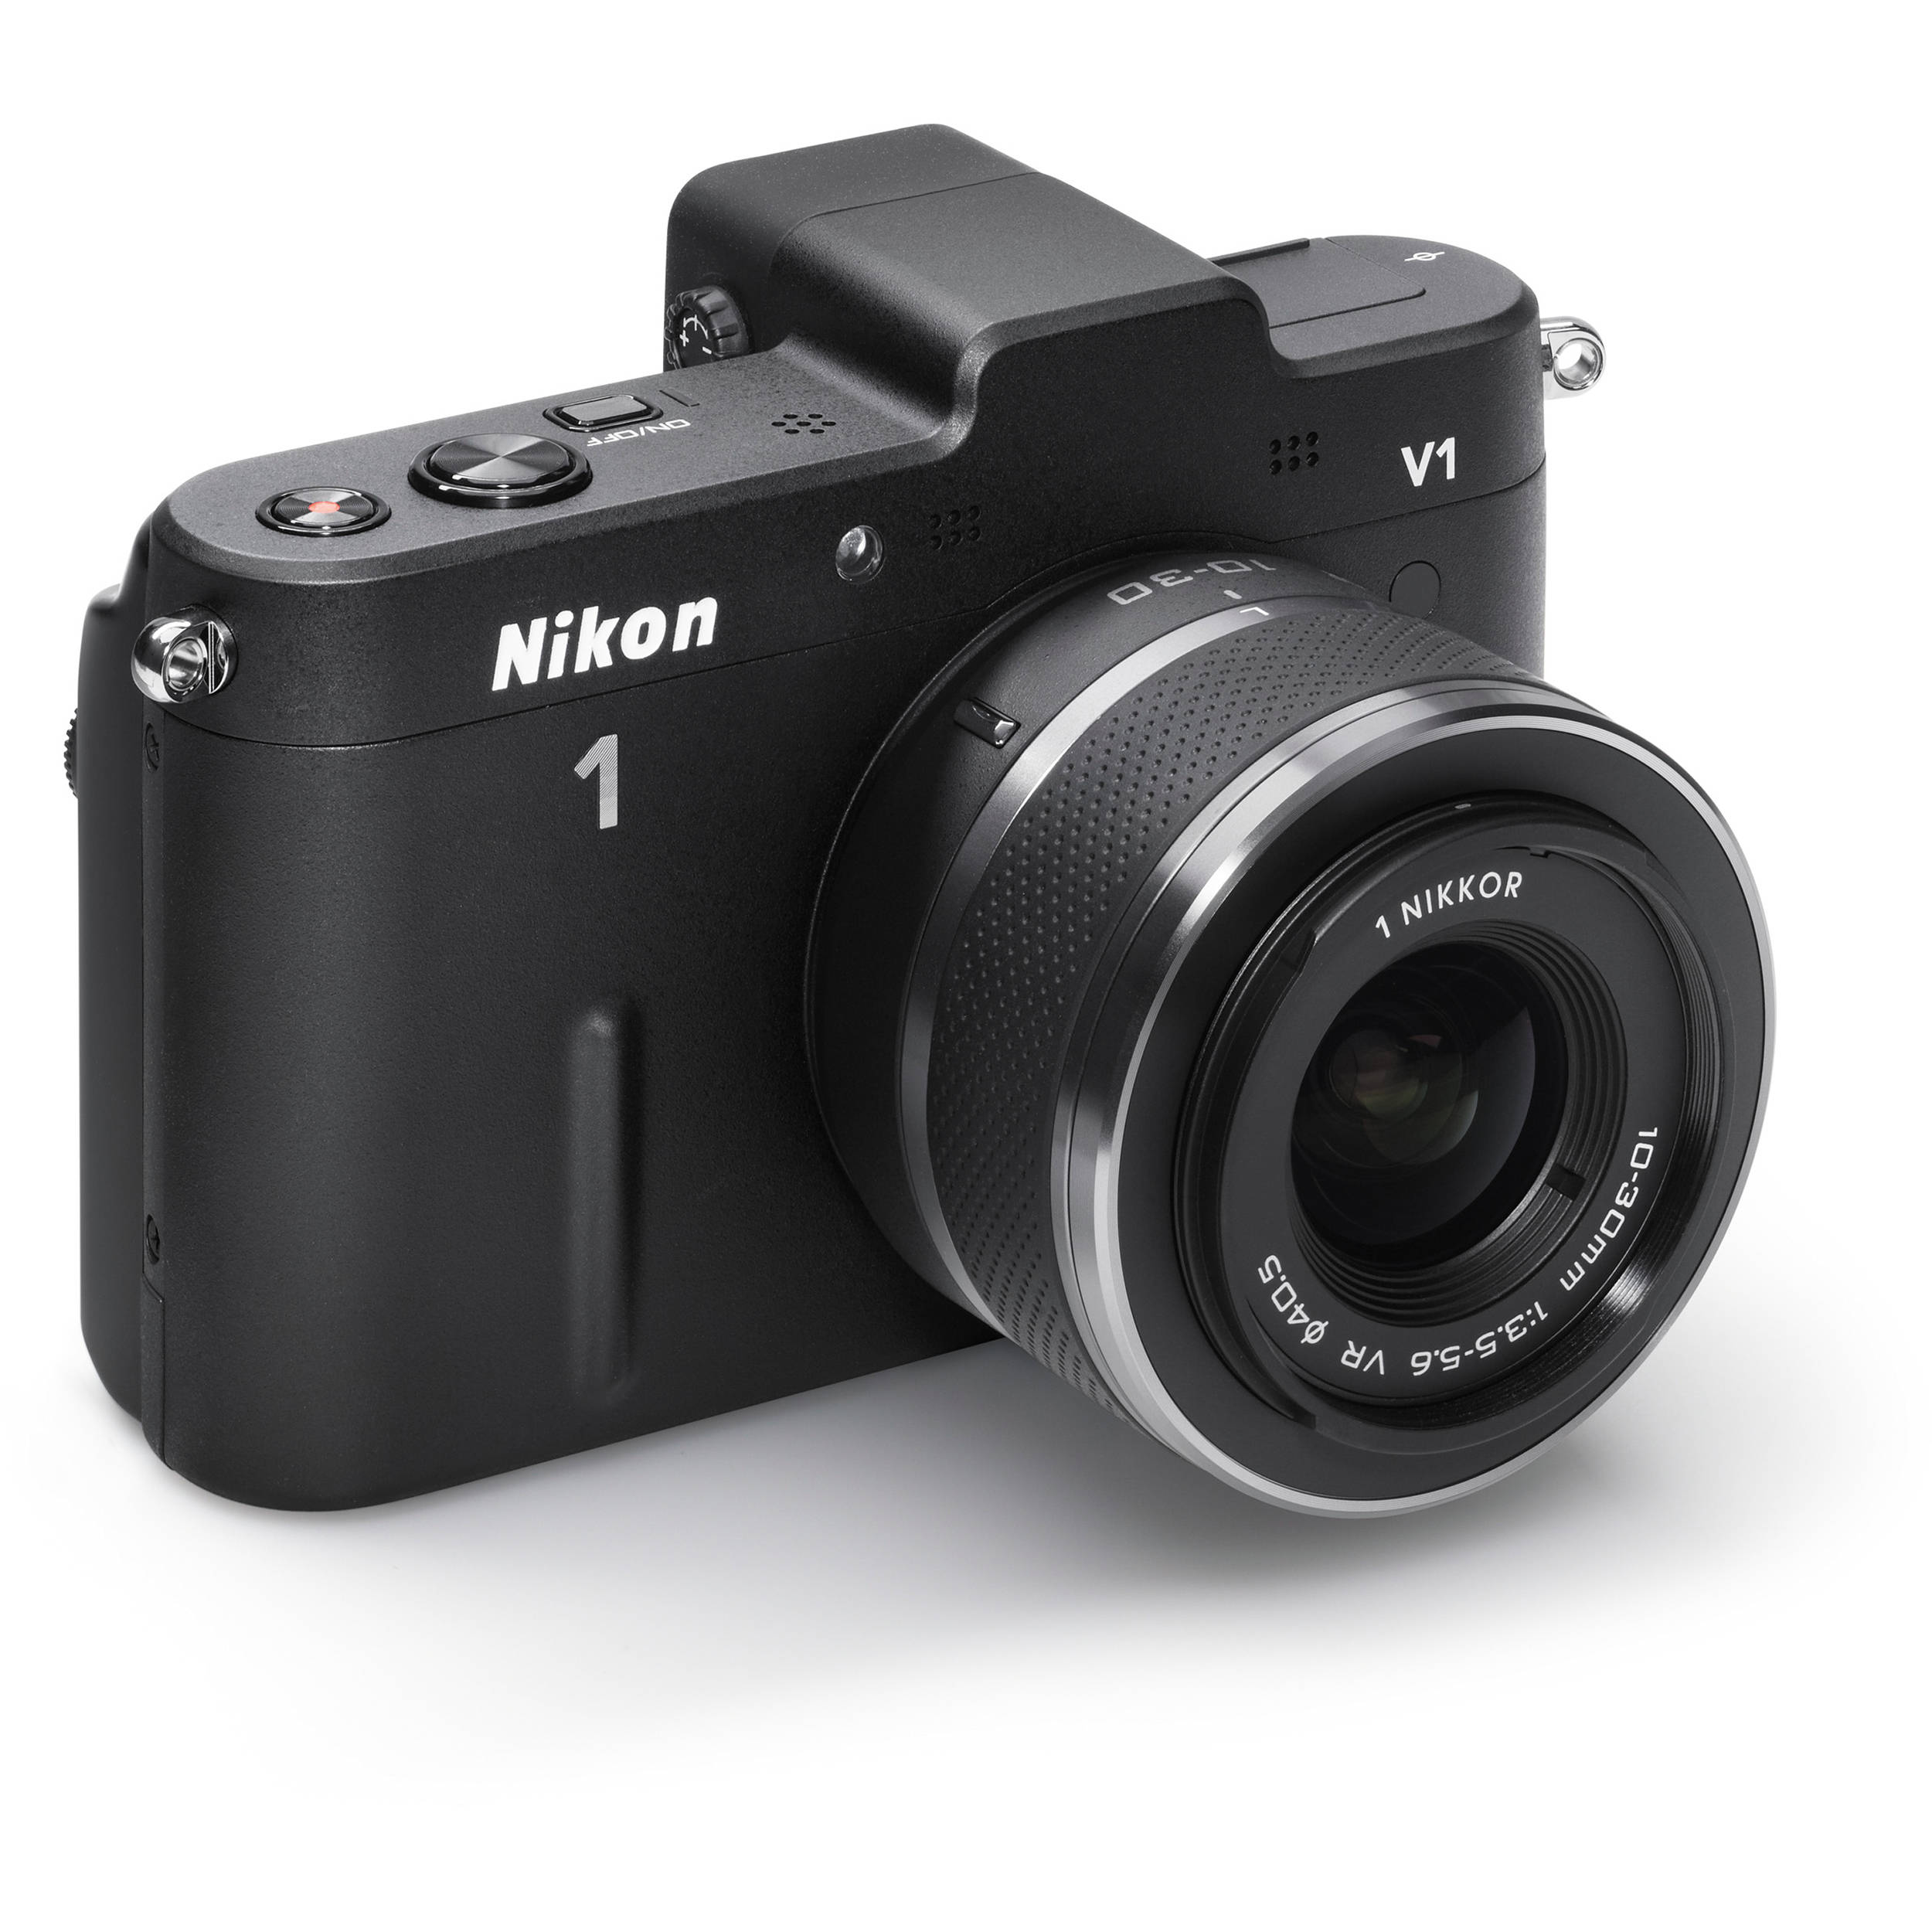 Nikon 1 V1 Digital Camera Drivers Mac